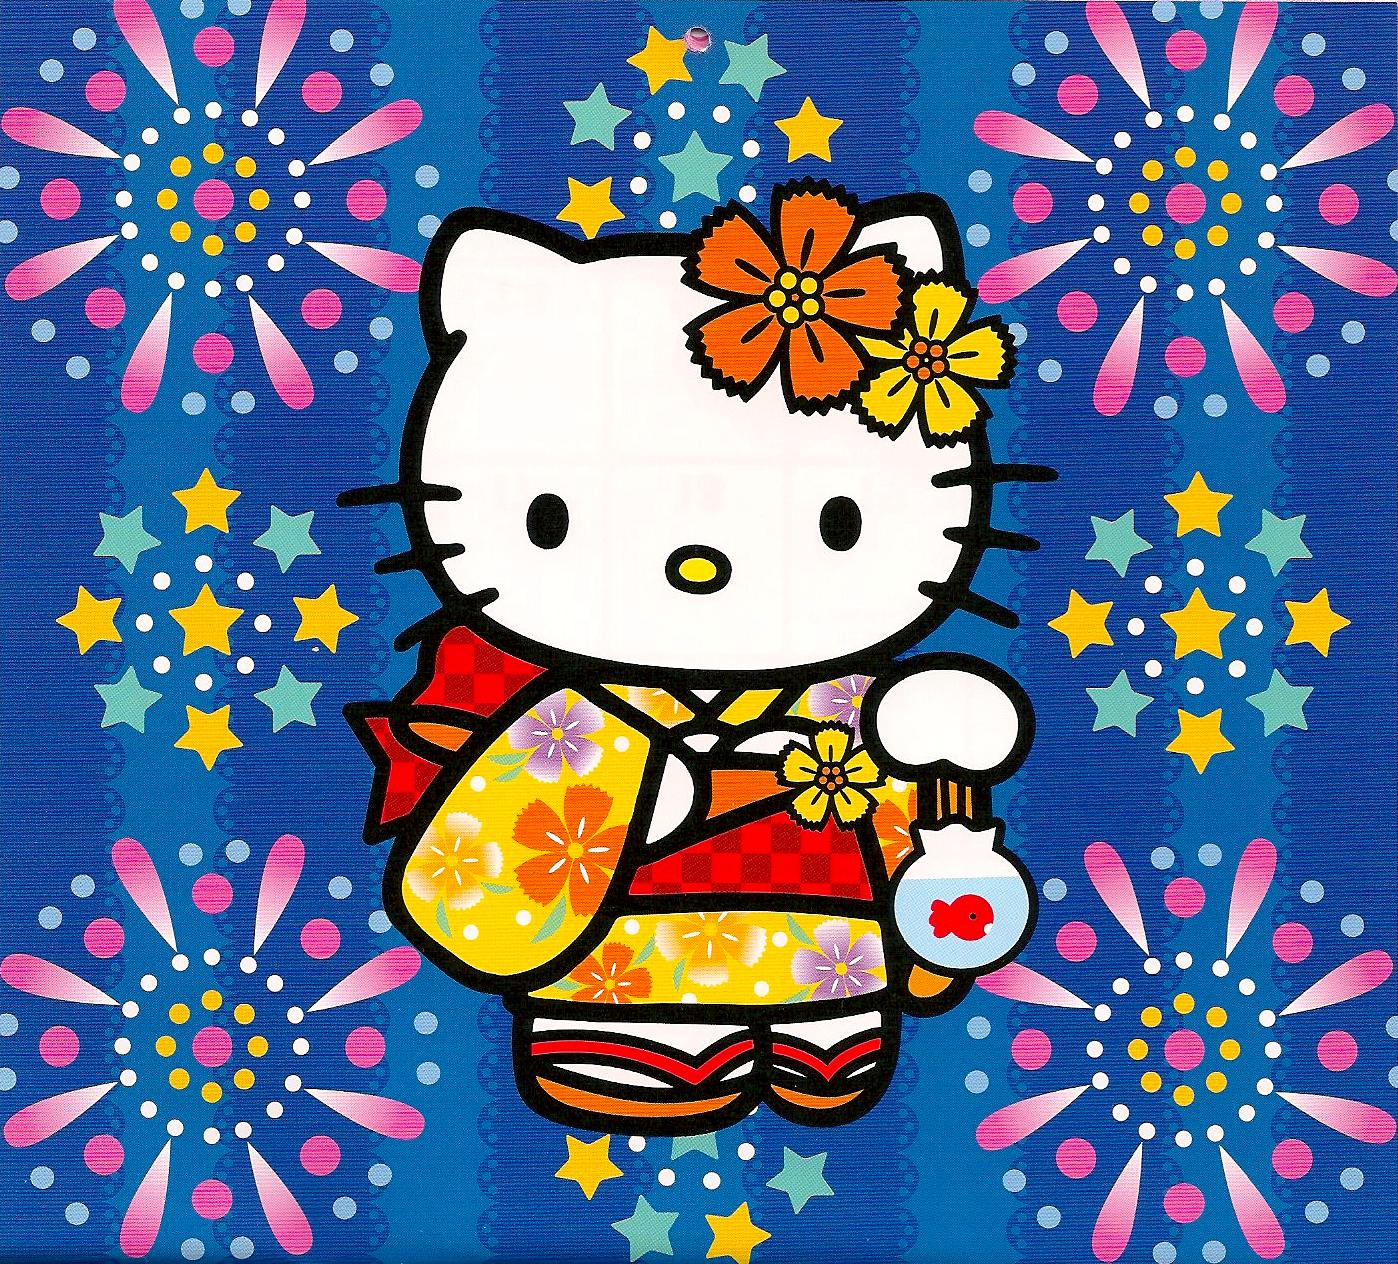 Hello Kitty August 2013 Calendar Hello kitty mini-cal august